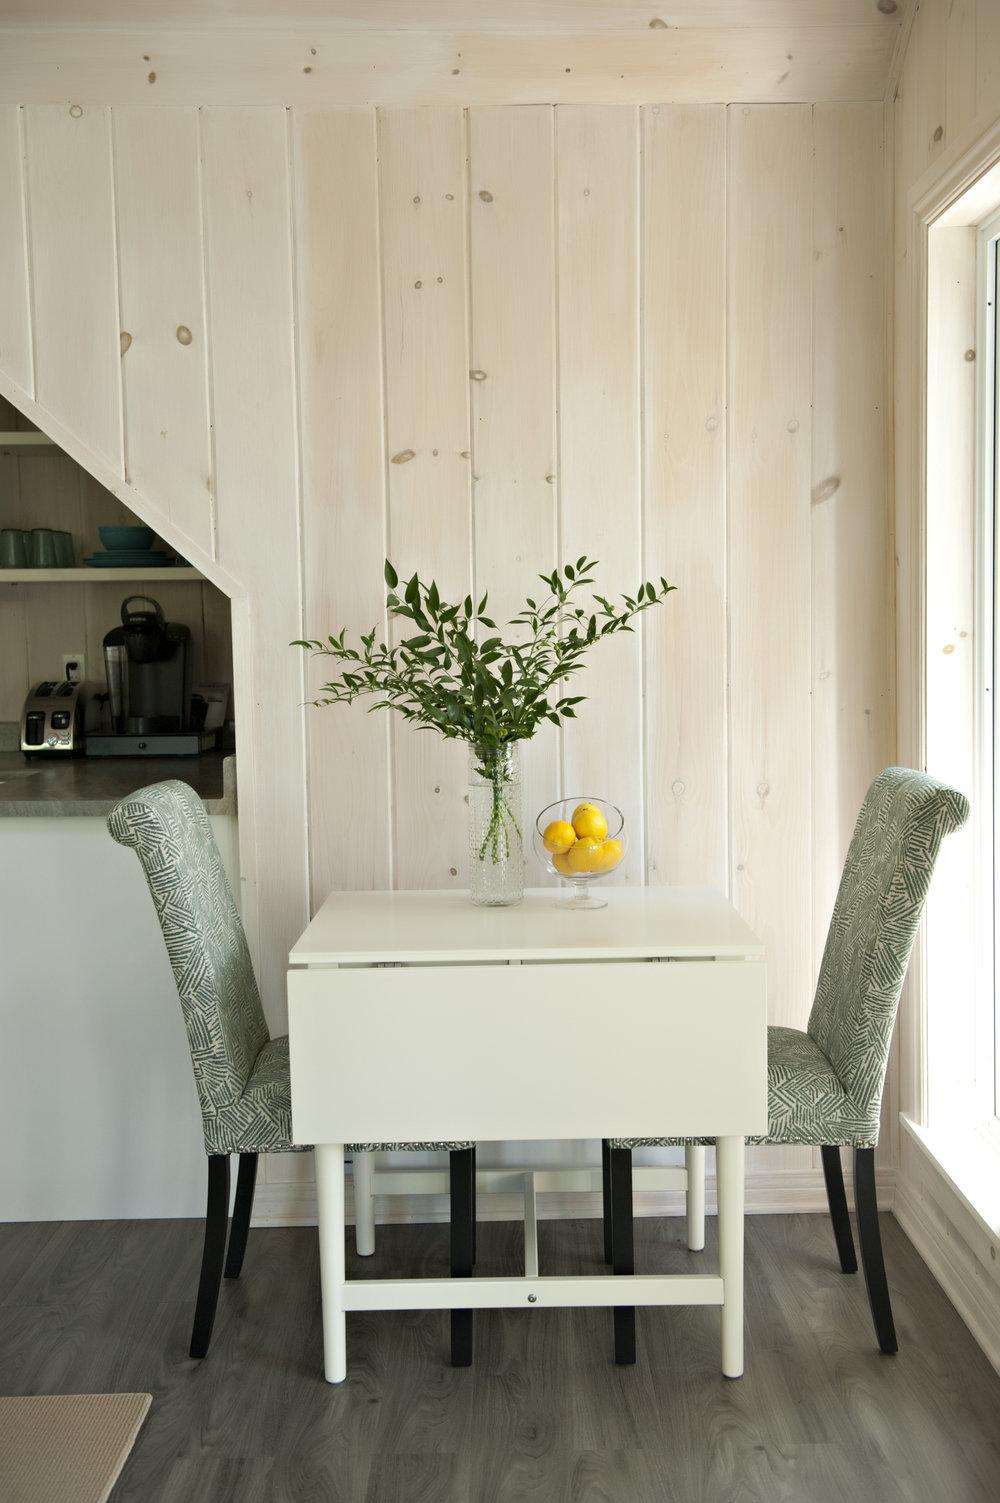 Candace-Plotz-Design-Beach-House-1-Project-Kitchen